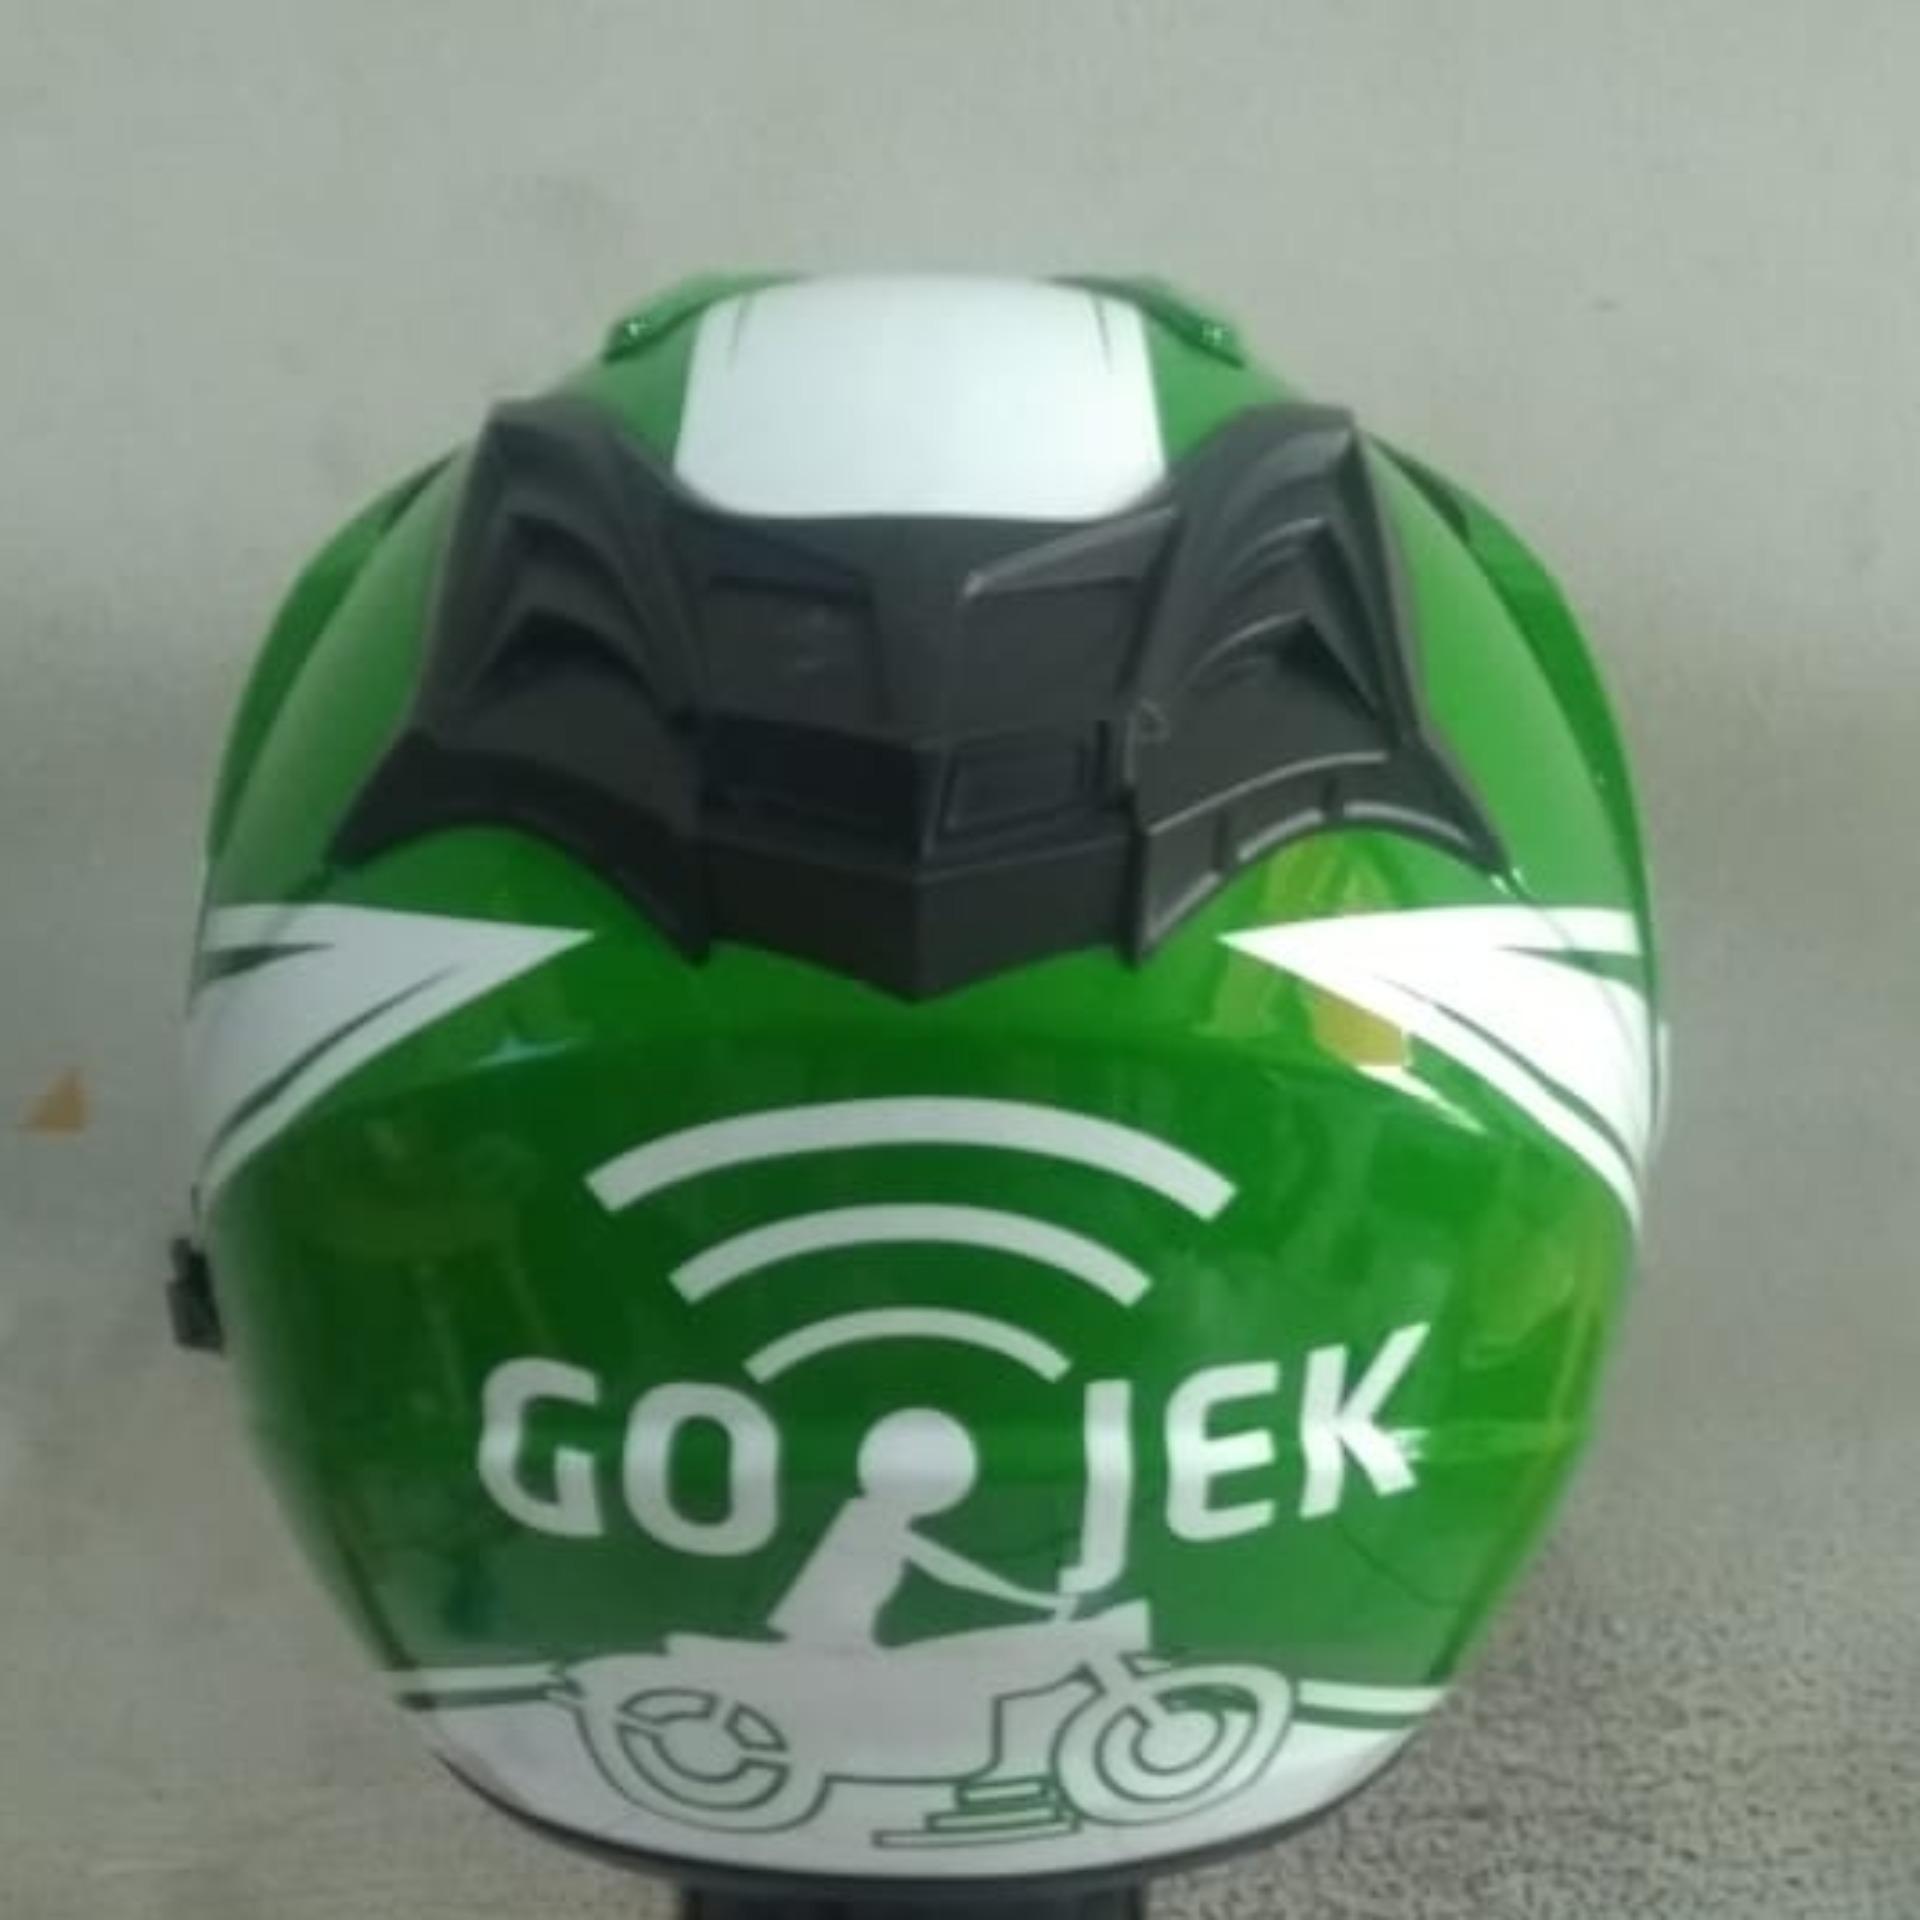 ... Helm Dewasa Ojek Online - GO - JEK - 3 ...